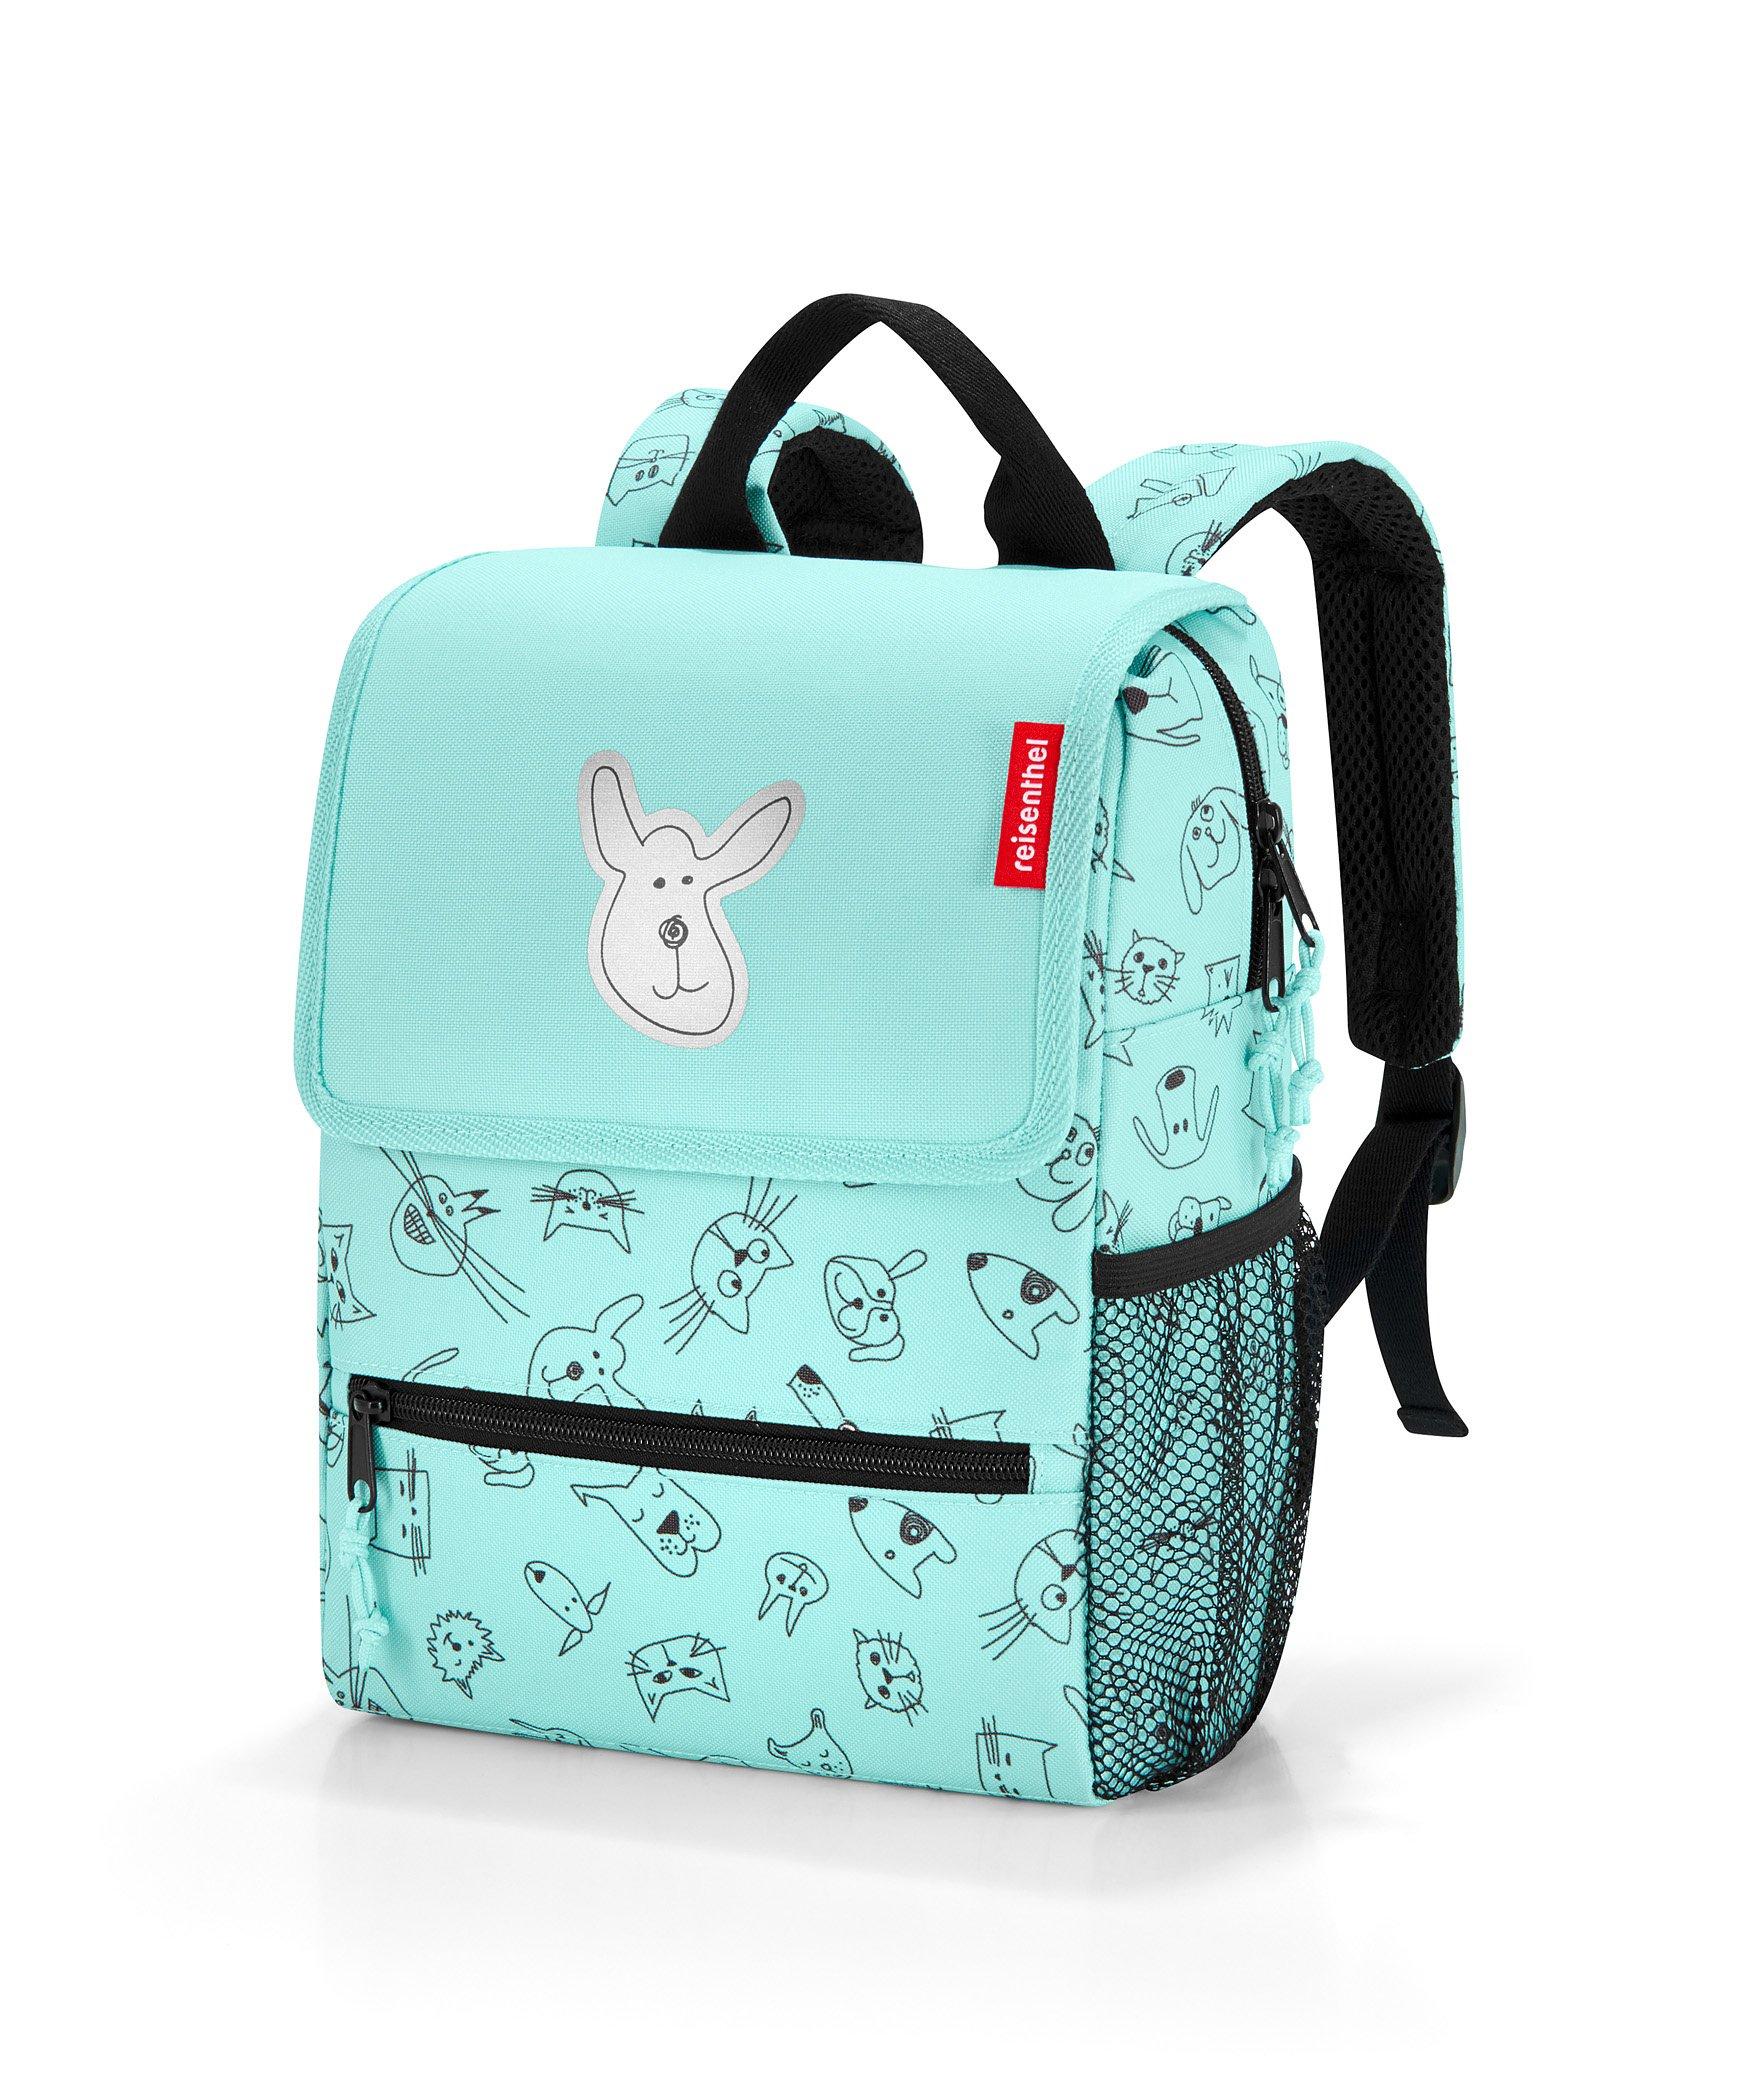 reisenthel-Kids-Outdoorset-fr-Kinder-2tlg-RucksackBackpack-und-Isotaschethermocase-Cats-Dogs-min